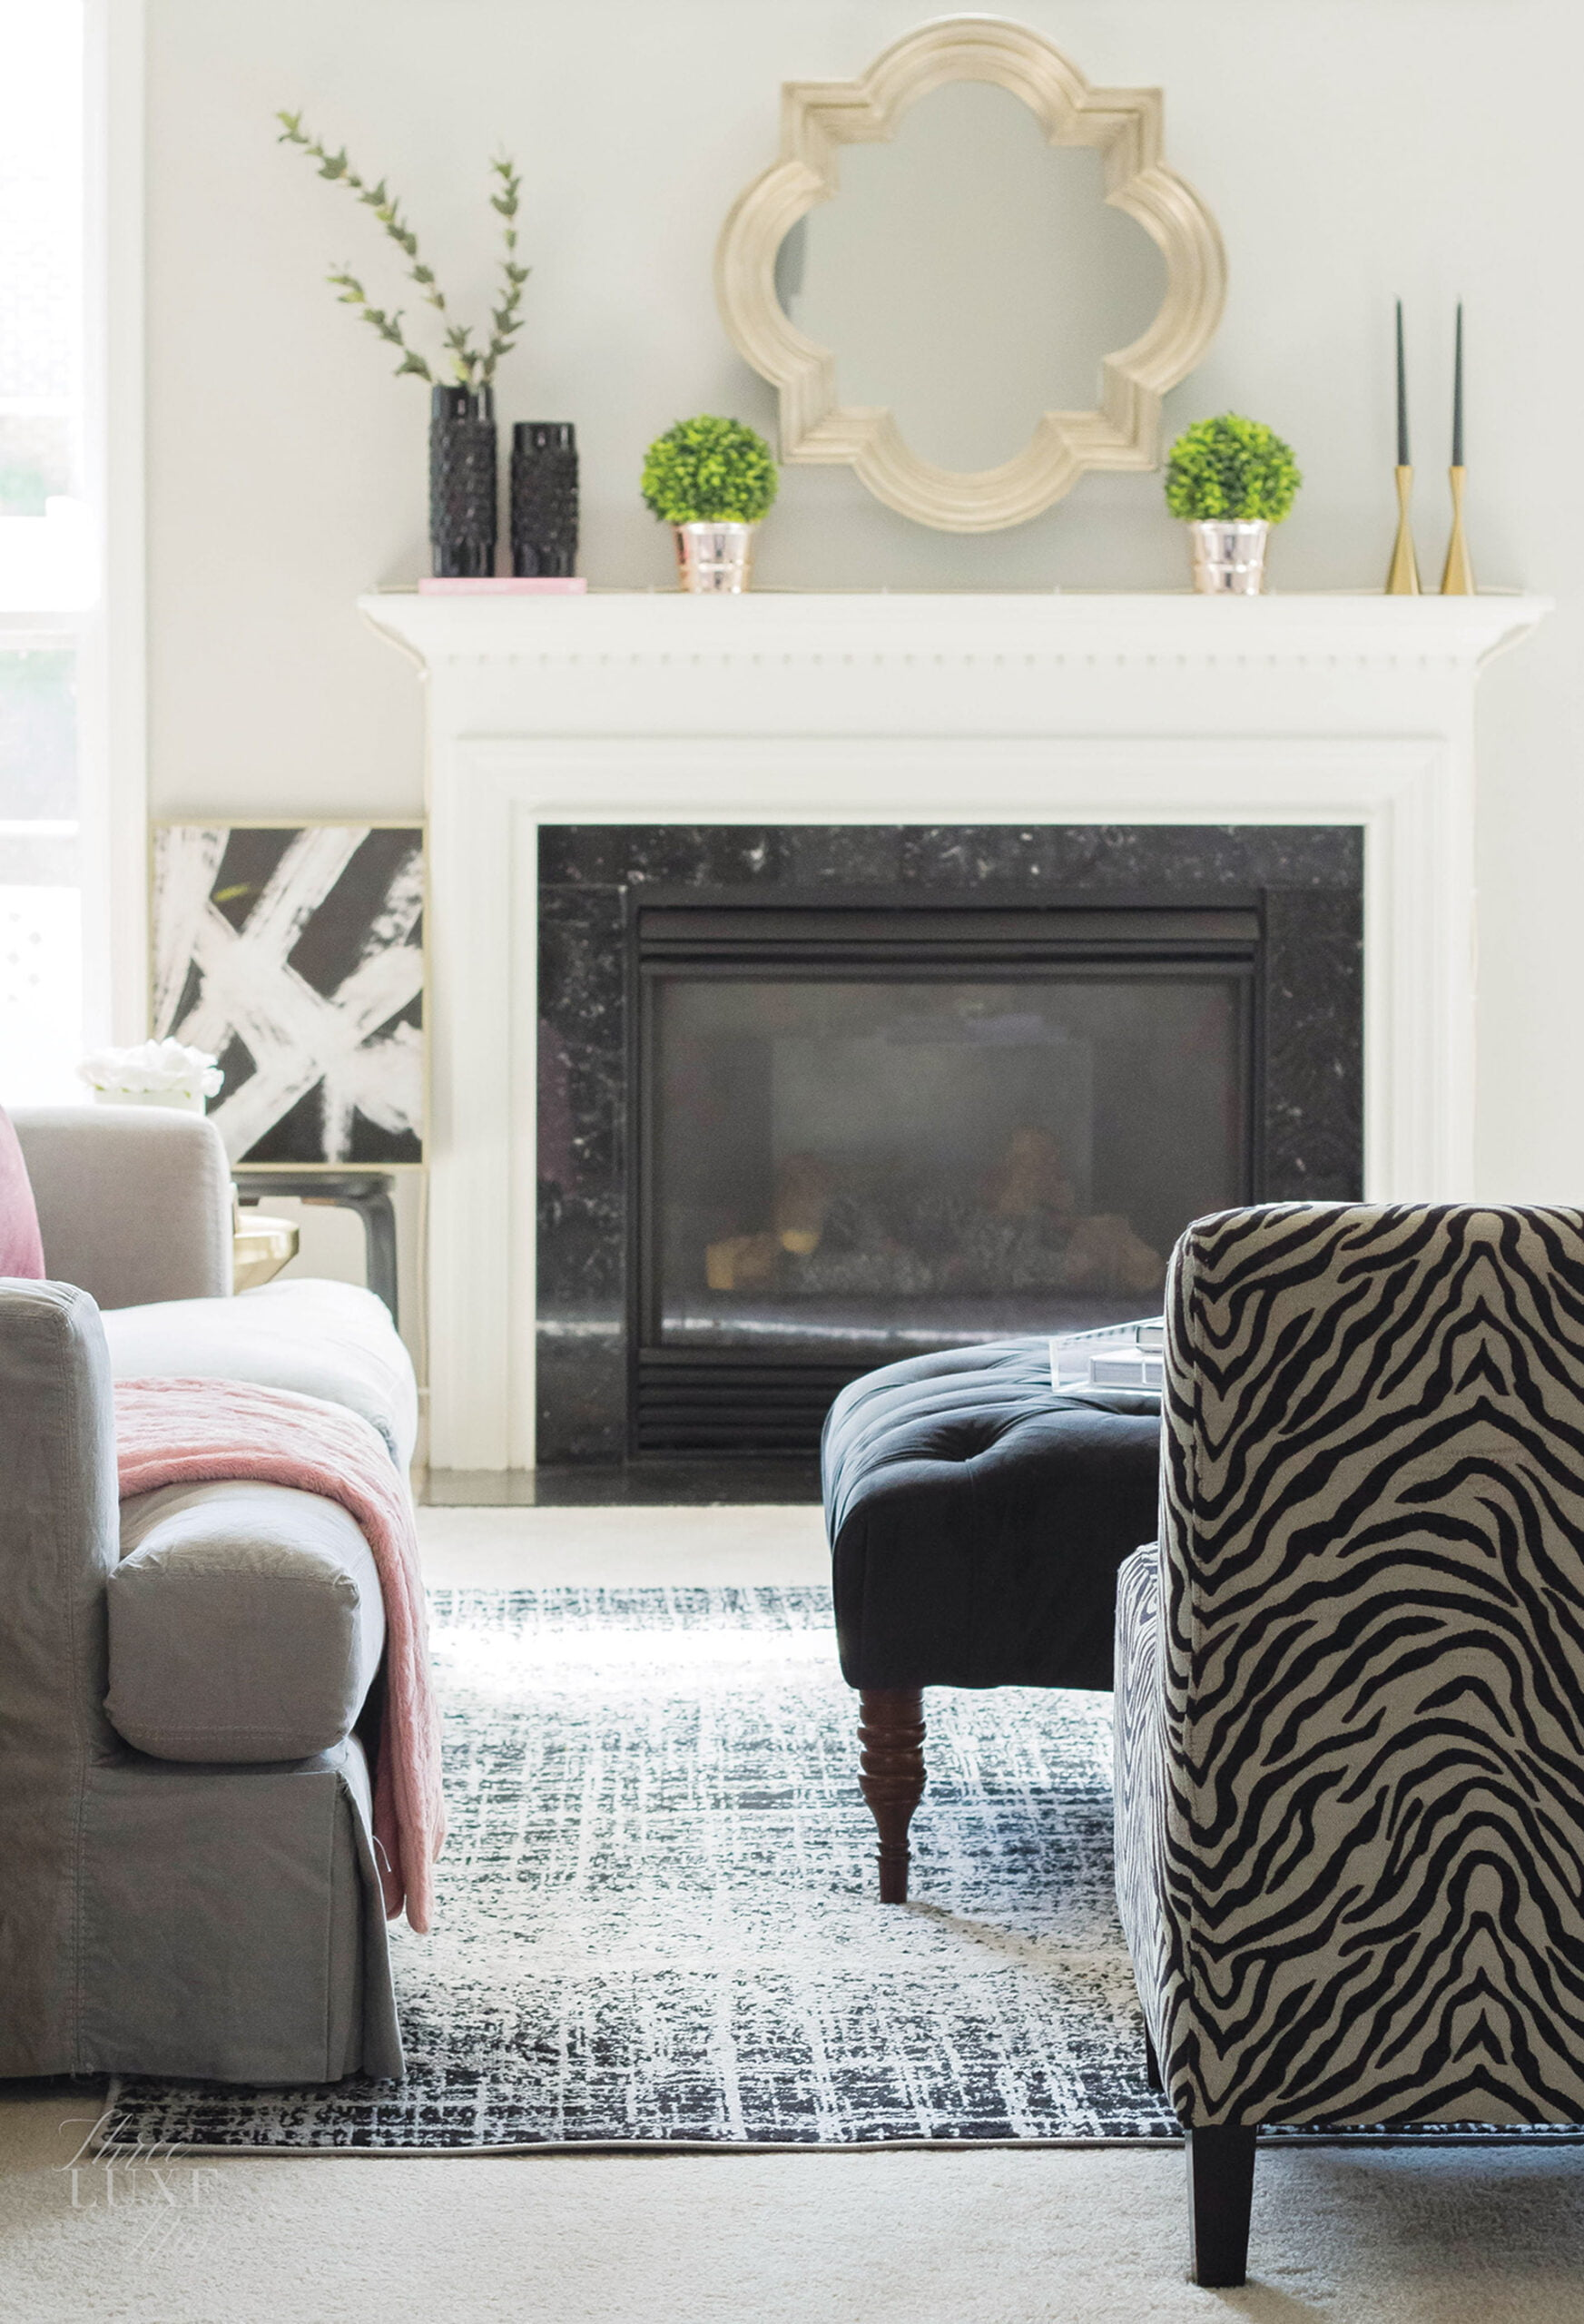 Arhaus sofa and Safavieh rug in living room